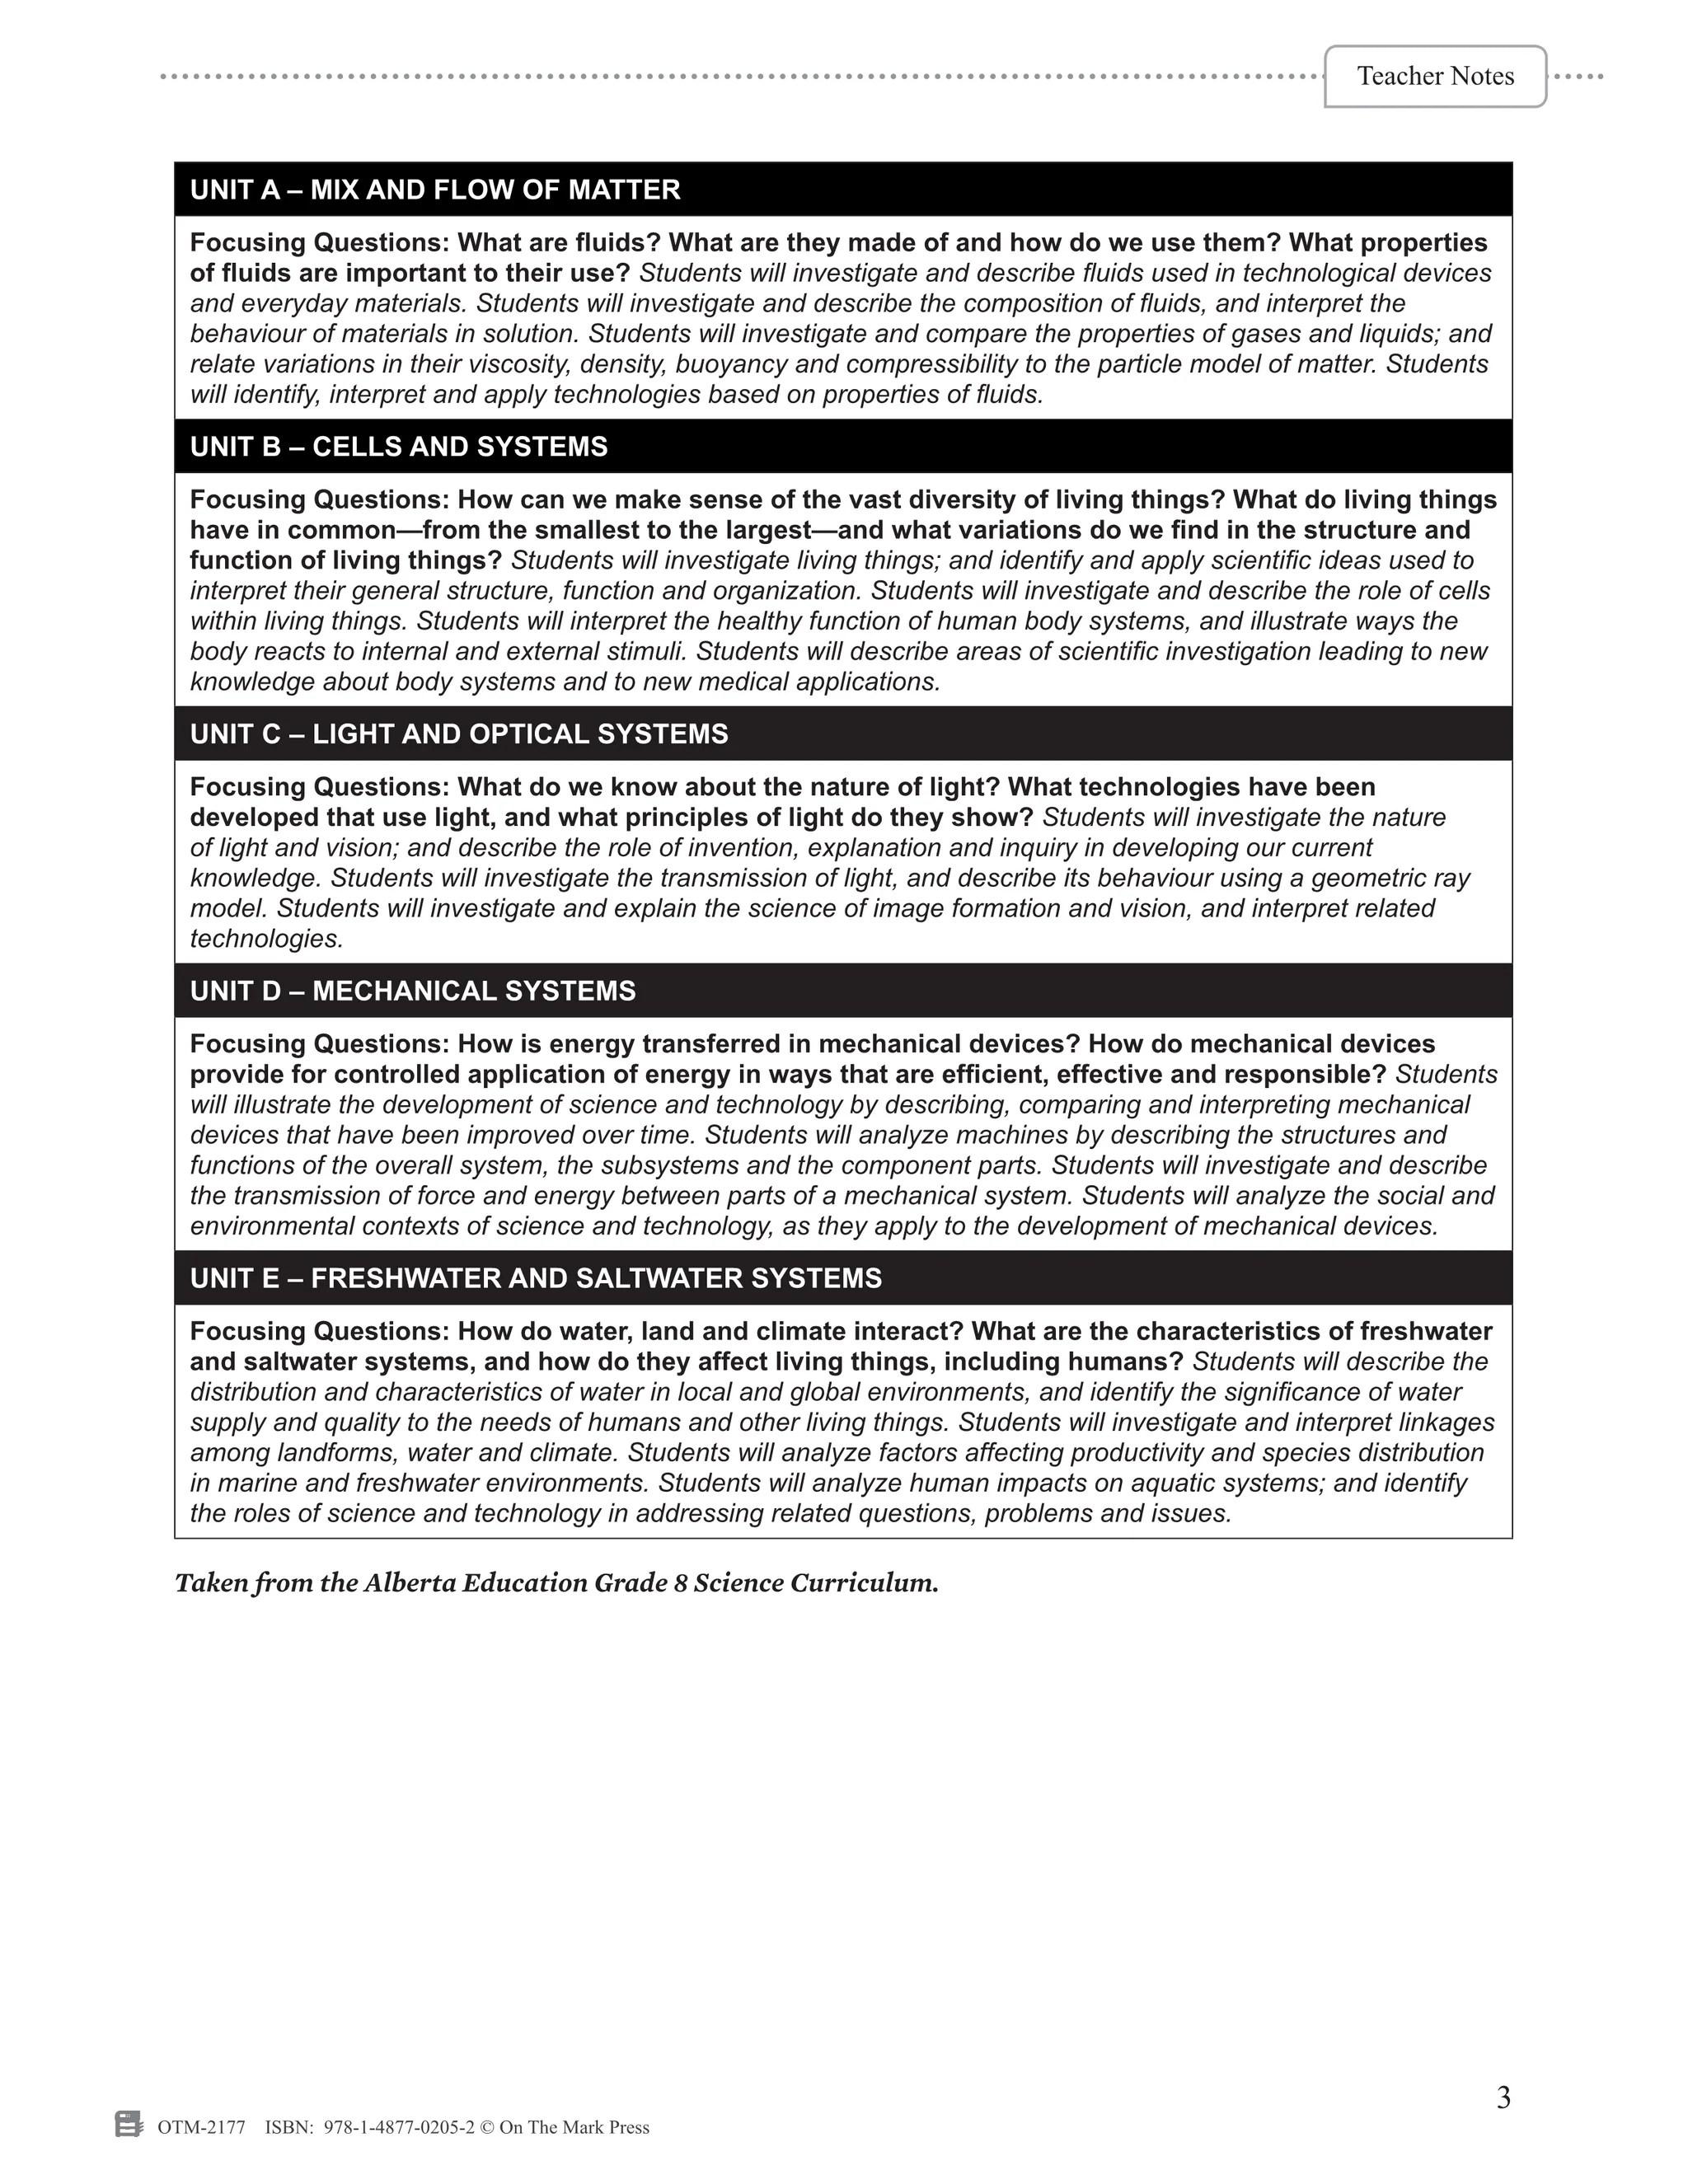 small resolution of Alberta Grade 8 Science Curriculum - On The Mark Press